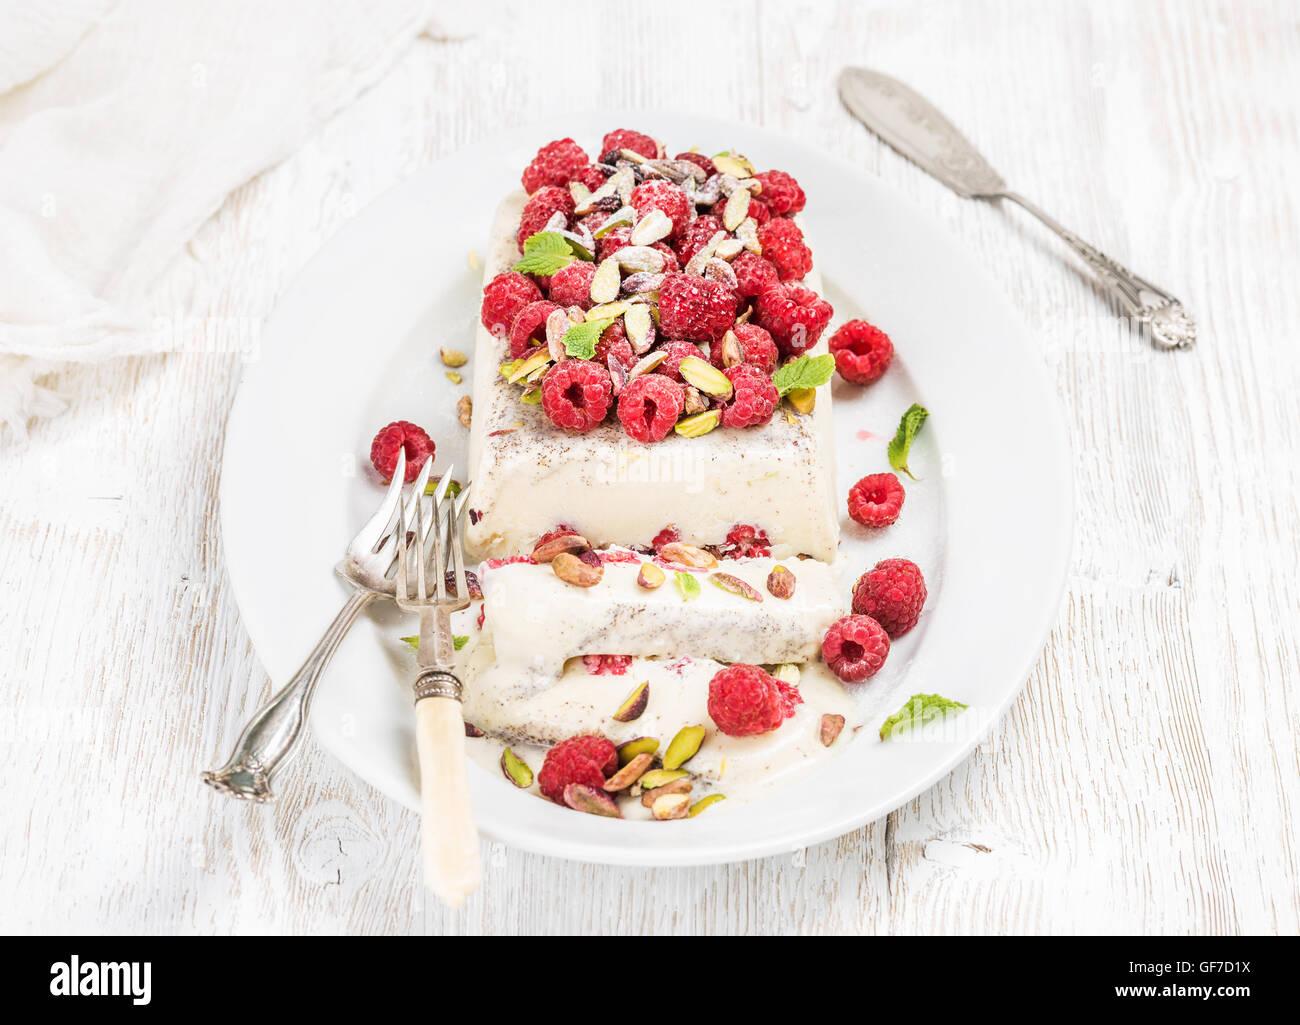 Homemade semifreddo with pistachio, raspberries and mint leaves - Stock Image